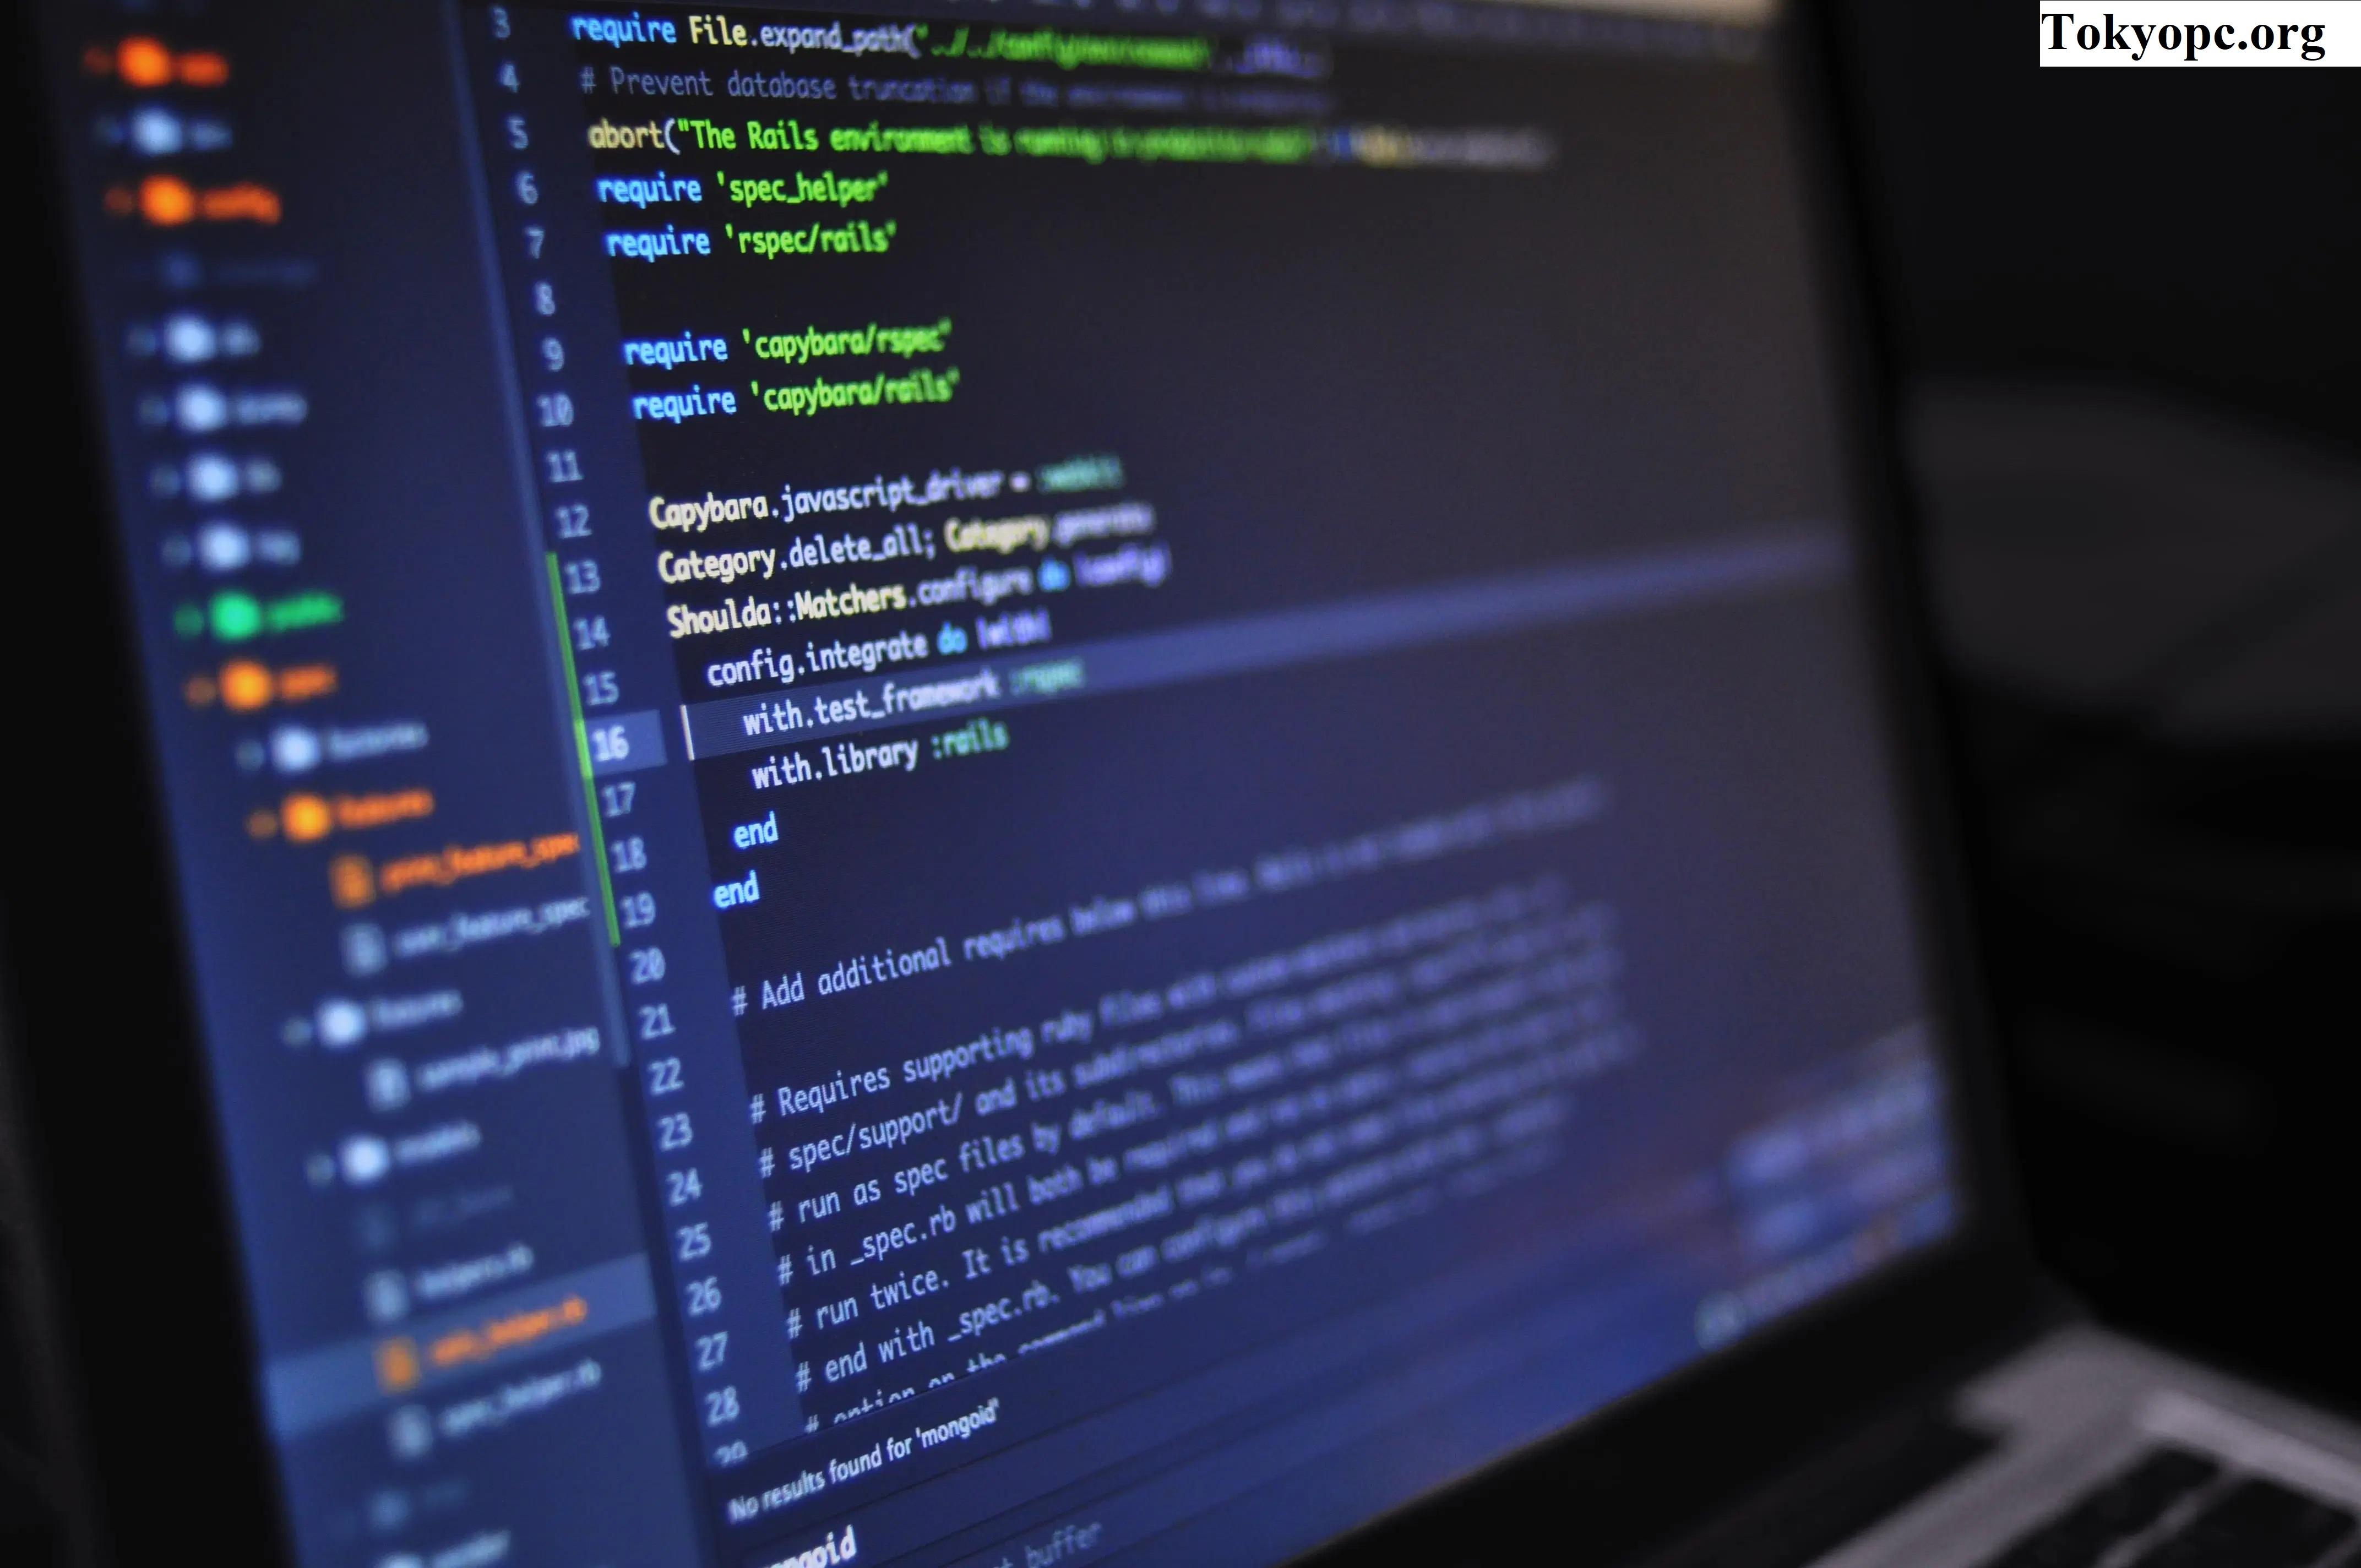 Ahli Ilmu Komputer di FIU Mendapatkan Penghargaan Serta Beasiswa Untuk Magang